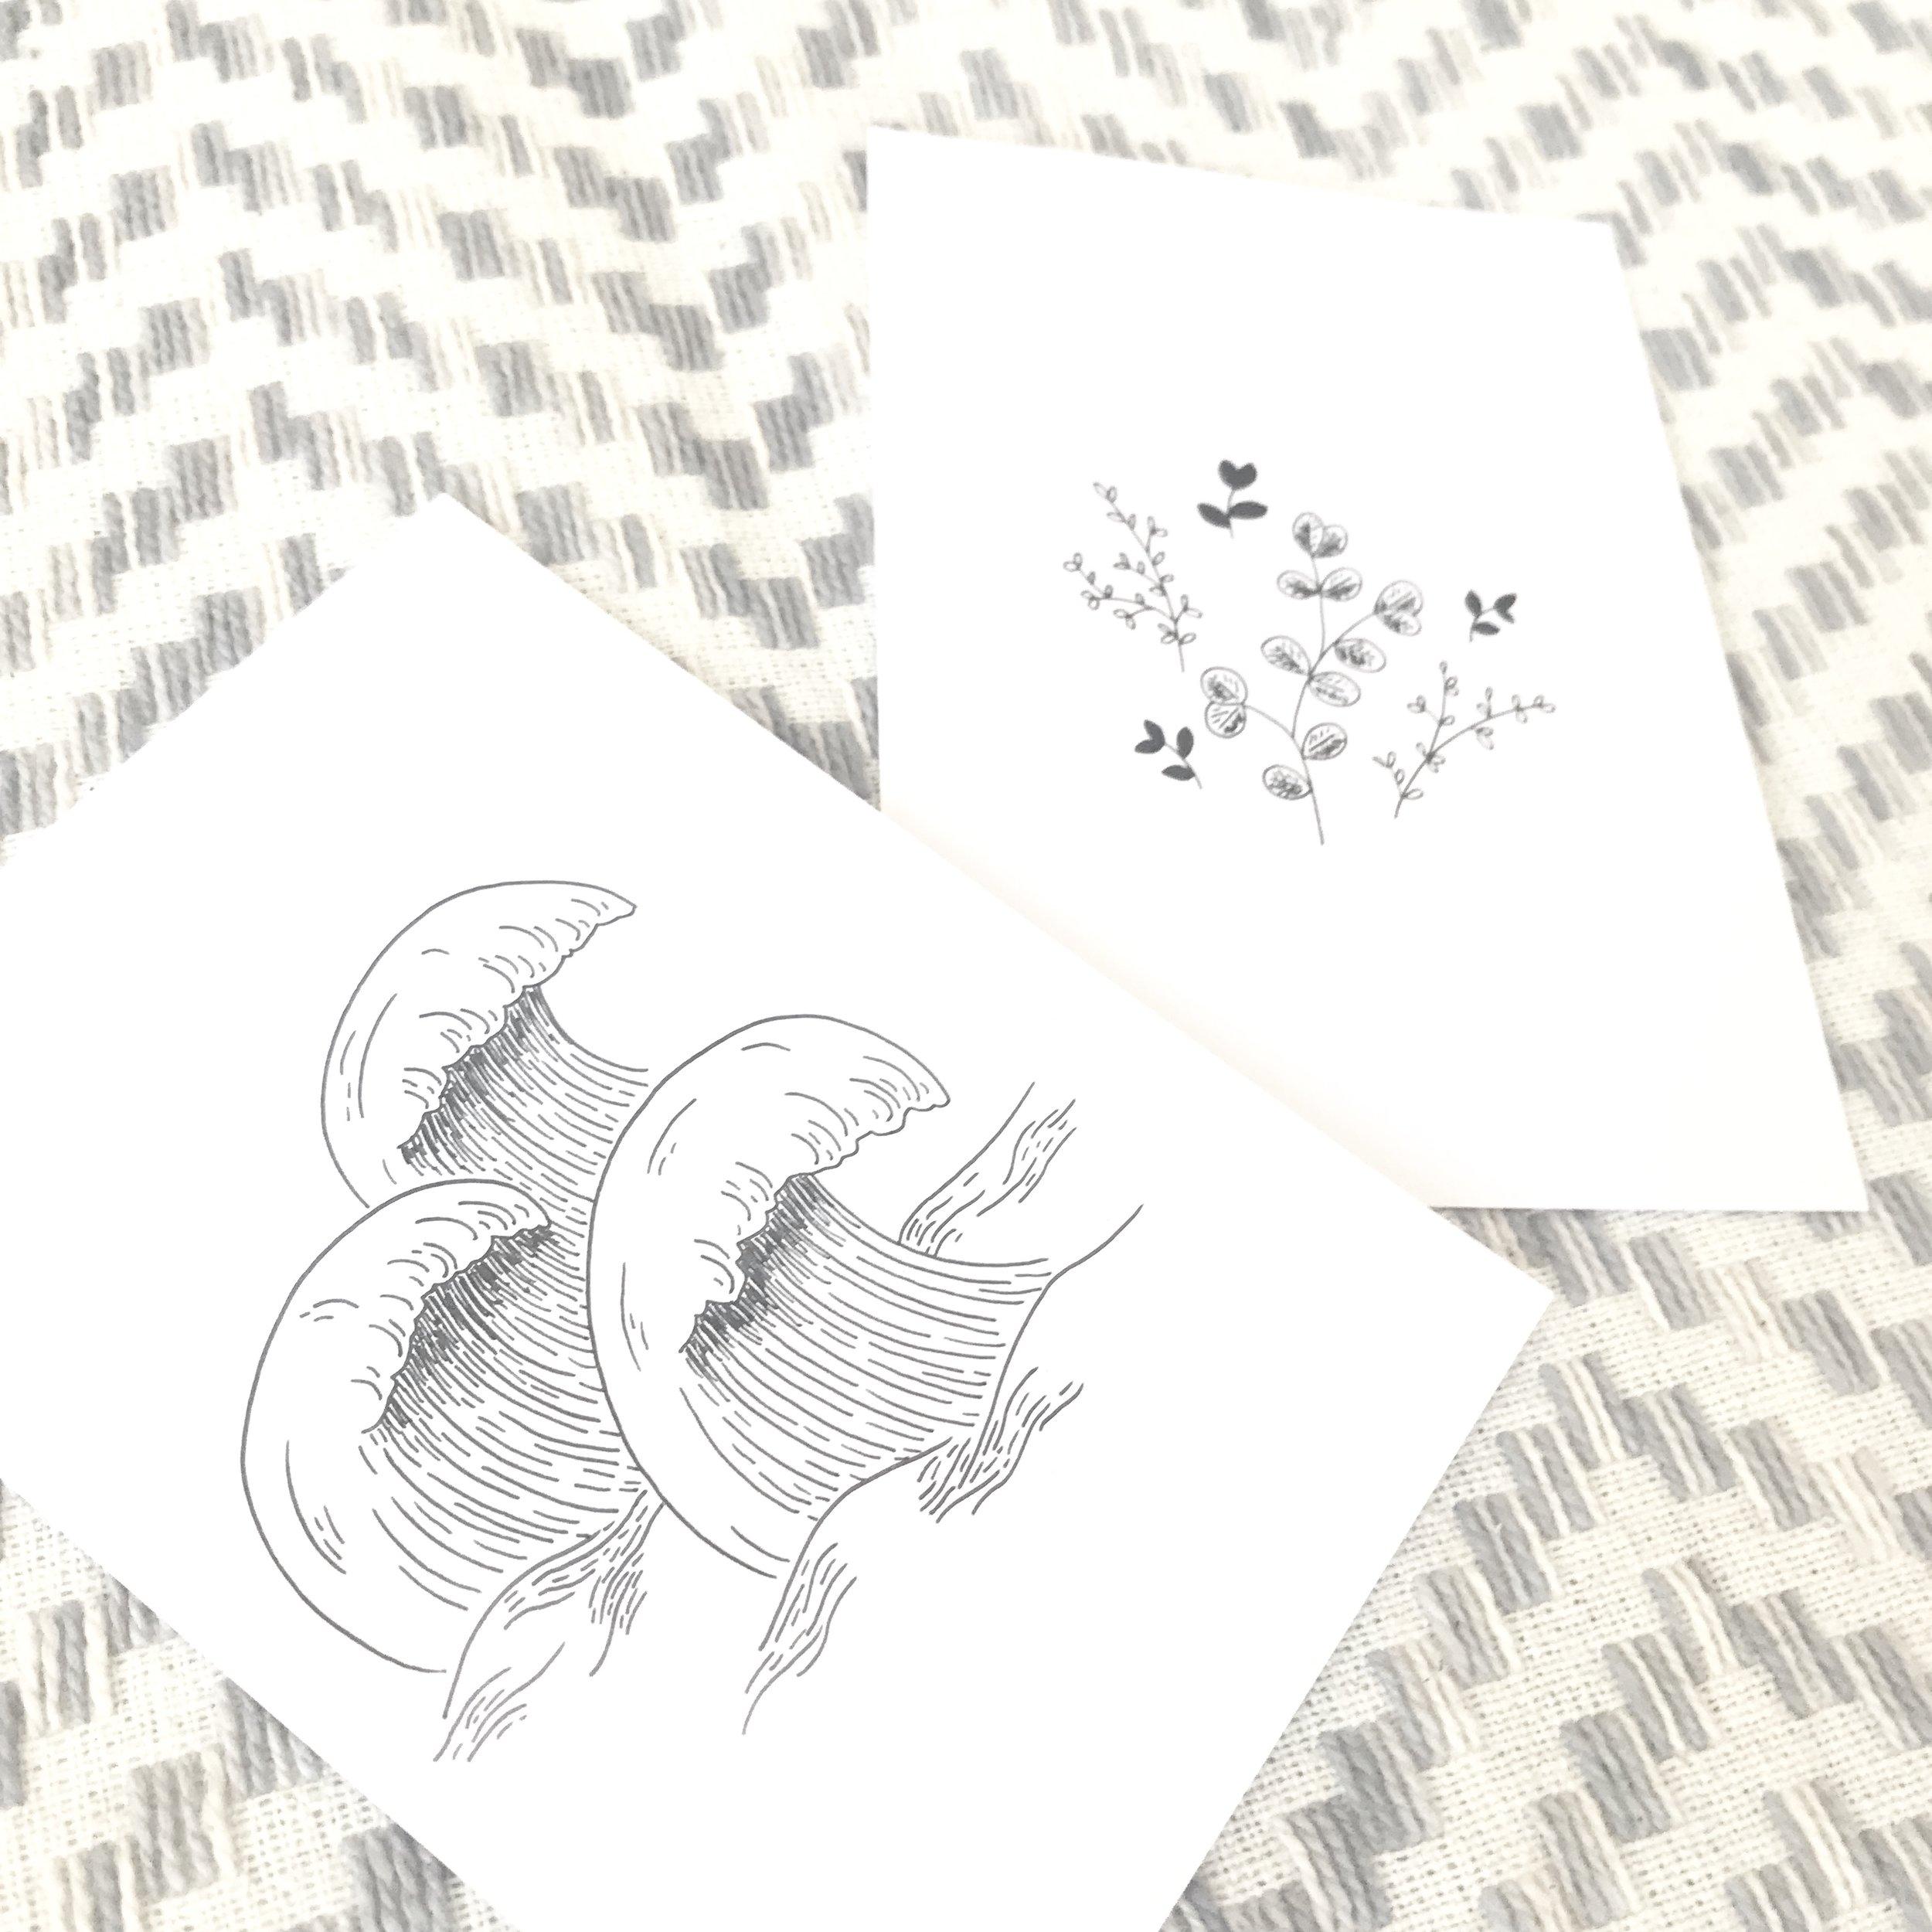 #the100dayproject sketchbook drawing illustration Bea & Bloom Creative Design Studio